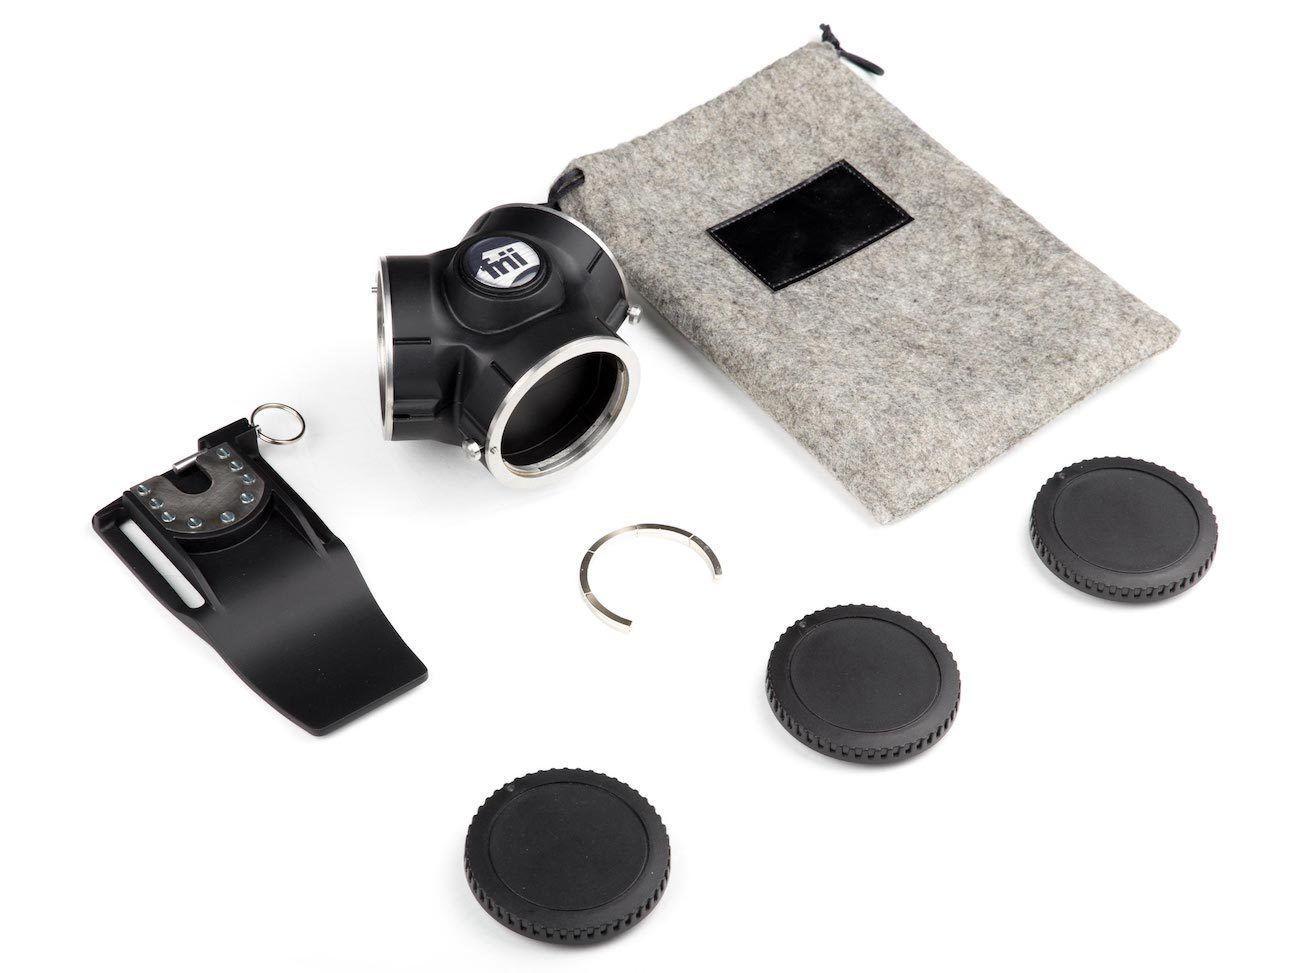 TriLens Triple Lens Holder